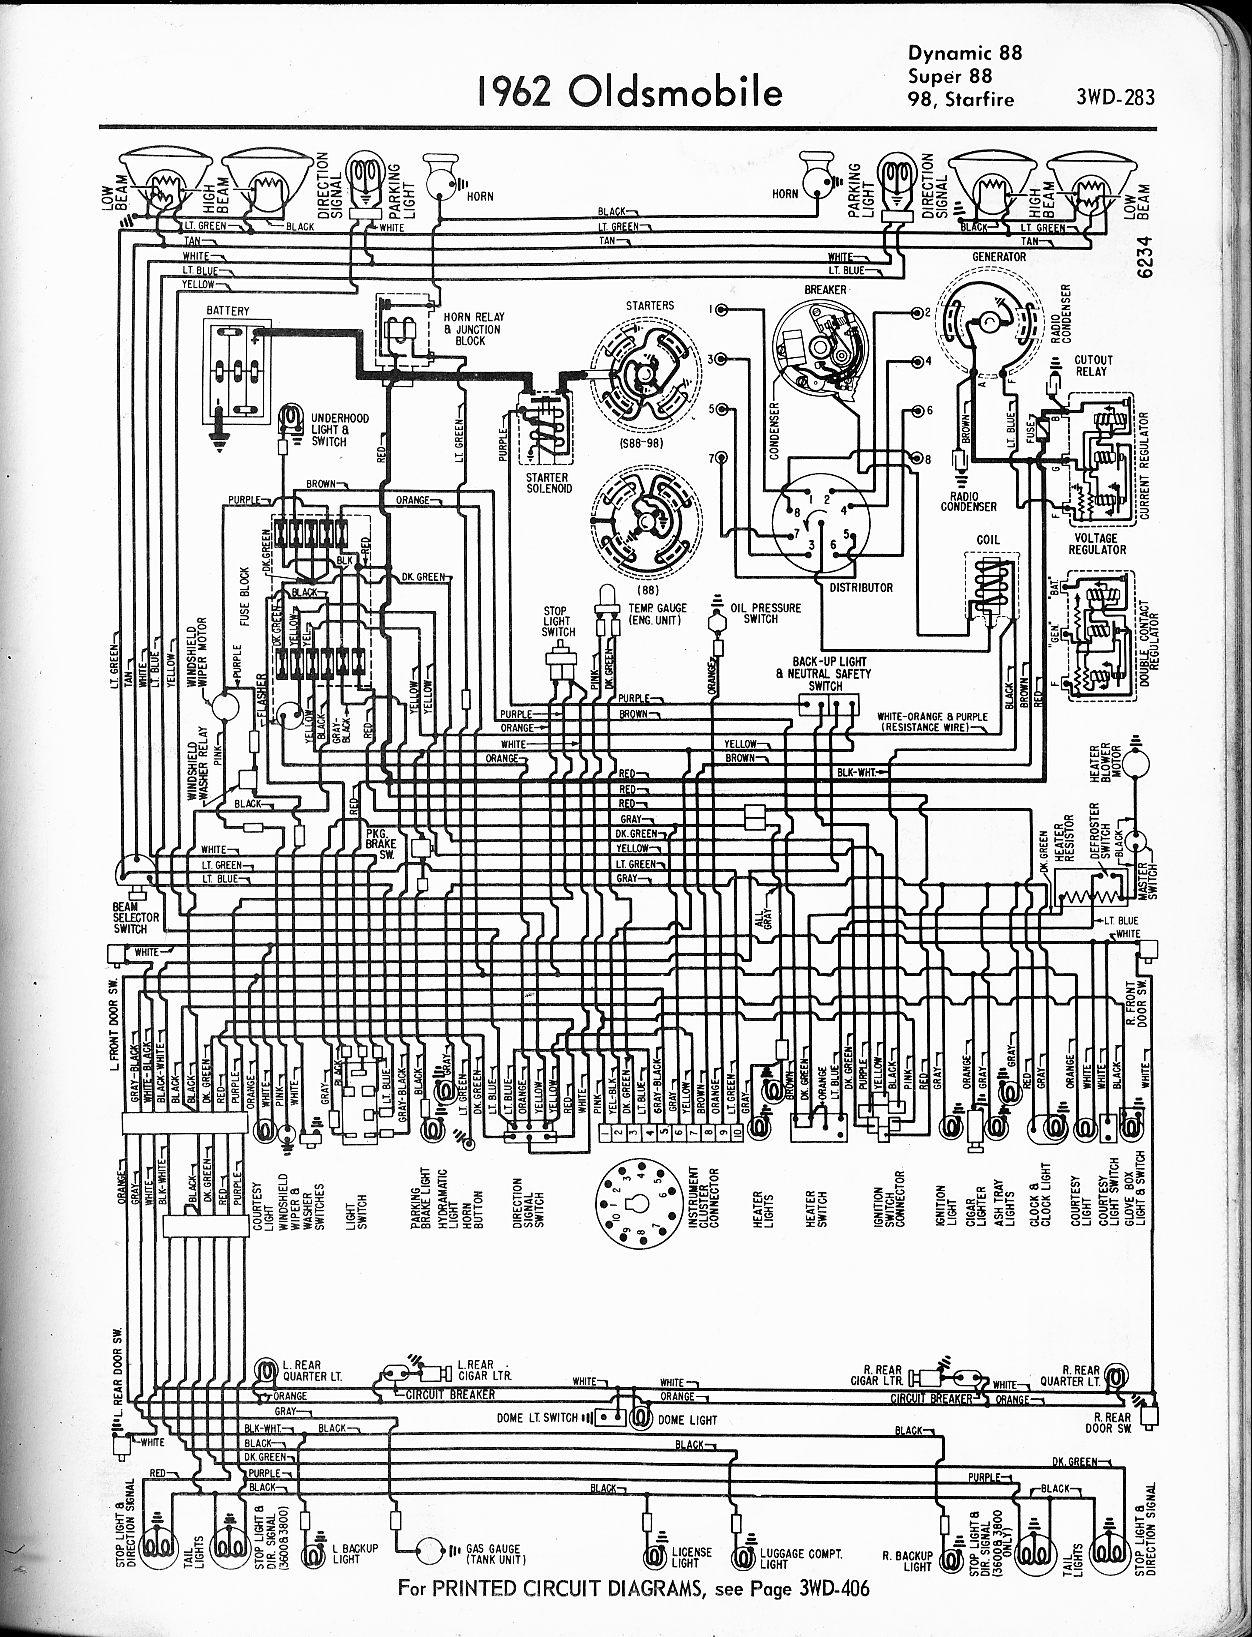 Wiring Diagram Cub Cadet Lt1024 : Wiring diagram for cub cadet lt rzt